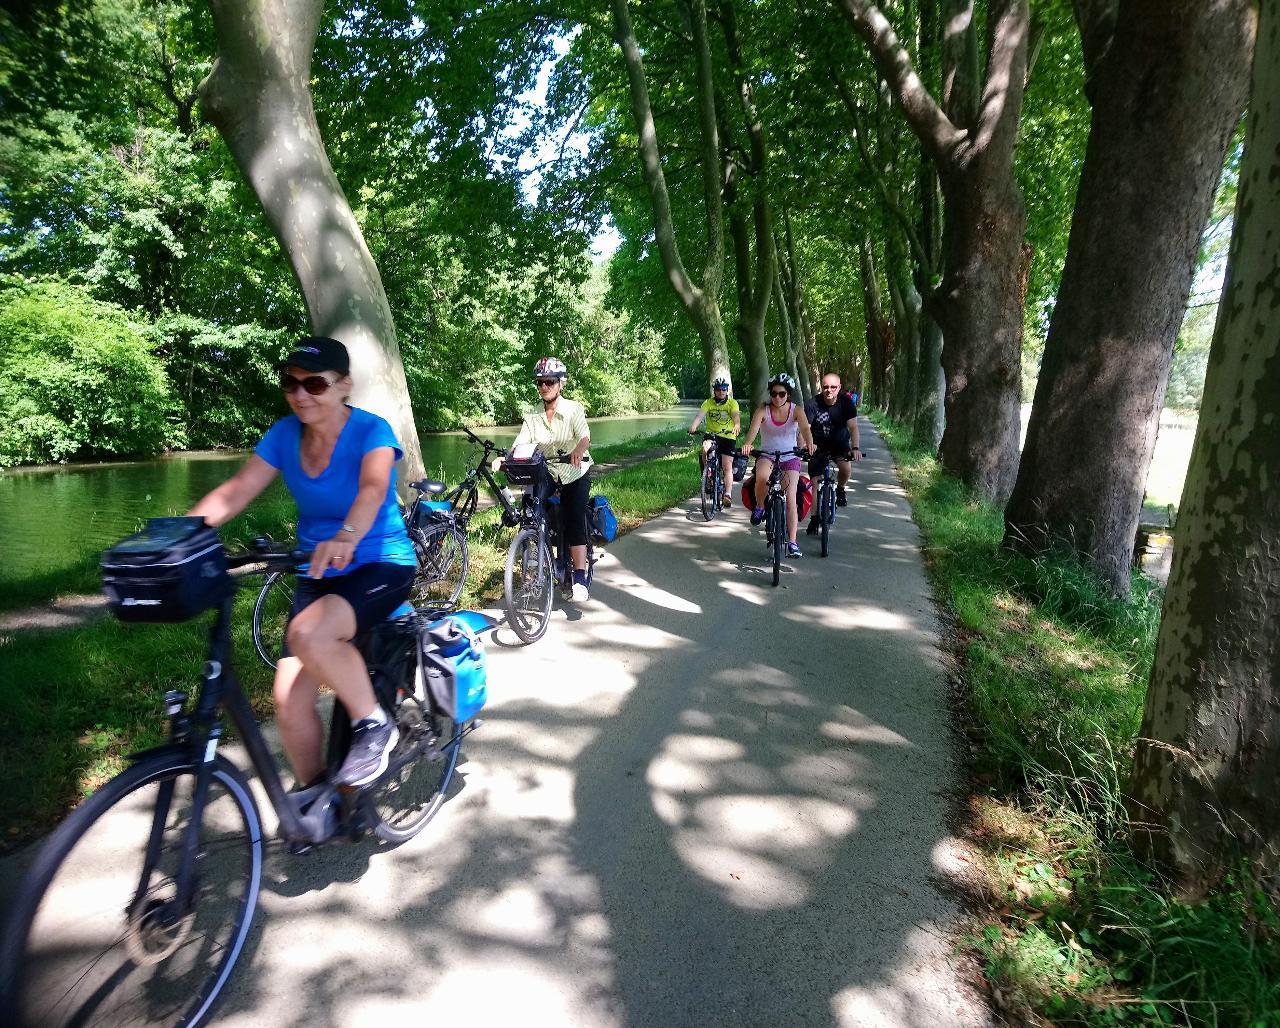 France 2020 - Bordeaux to Toulouse Cycle Tour